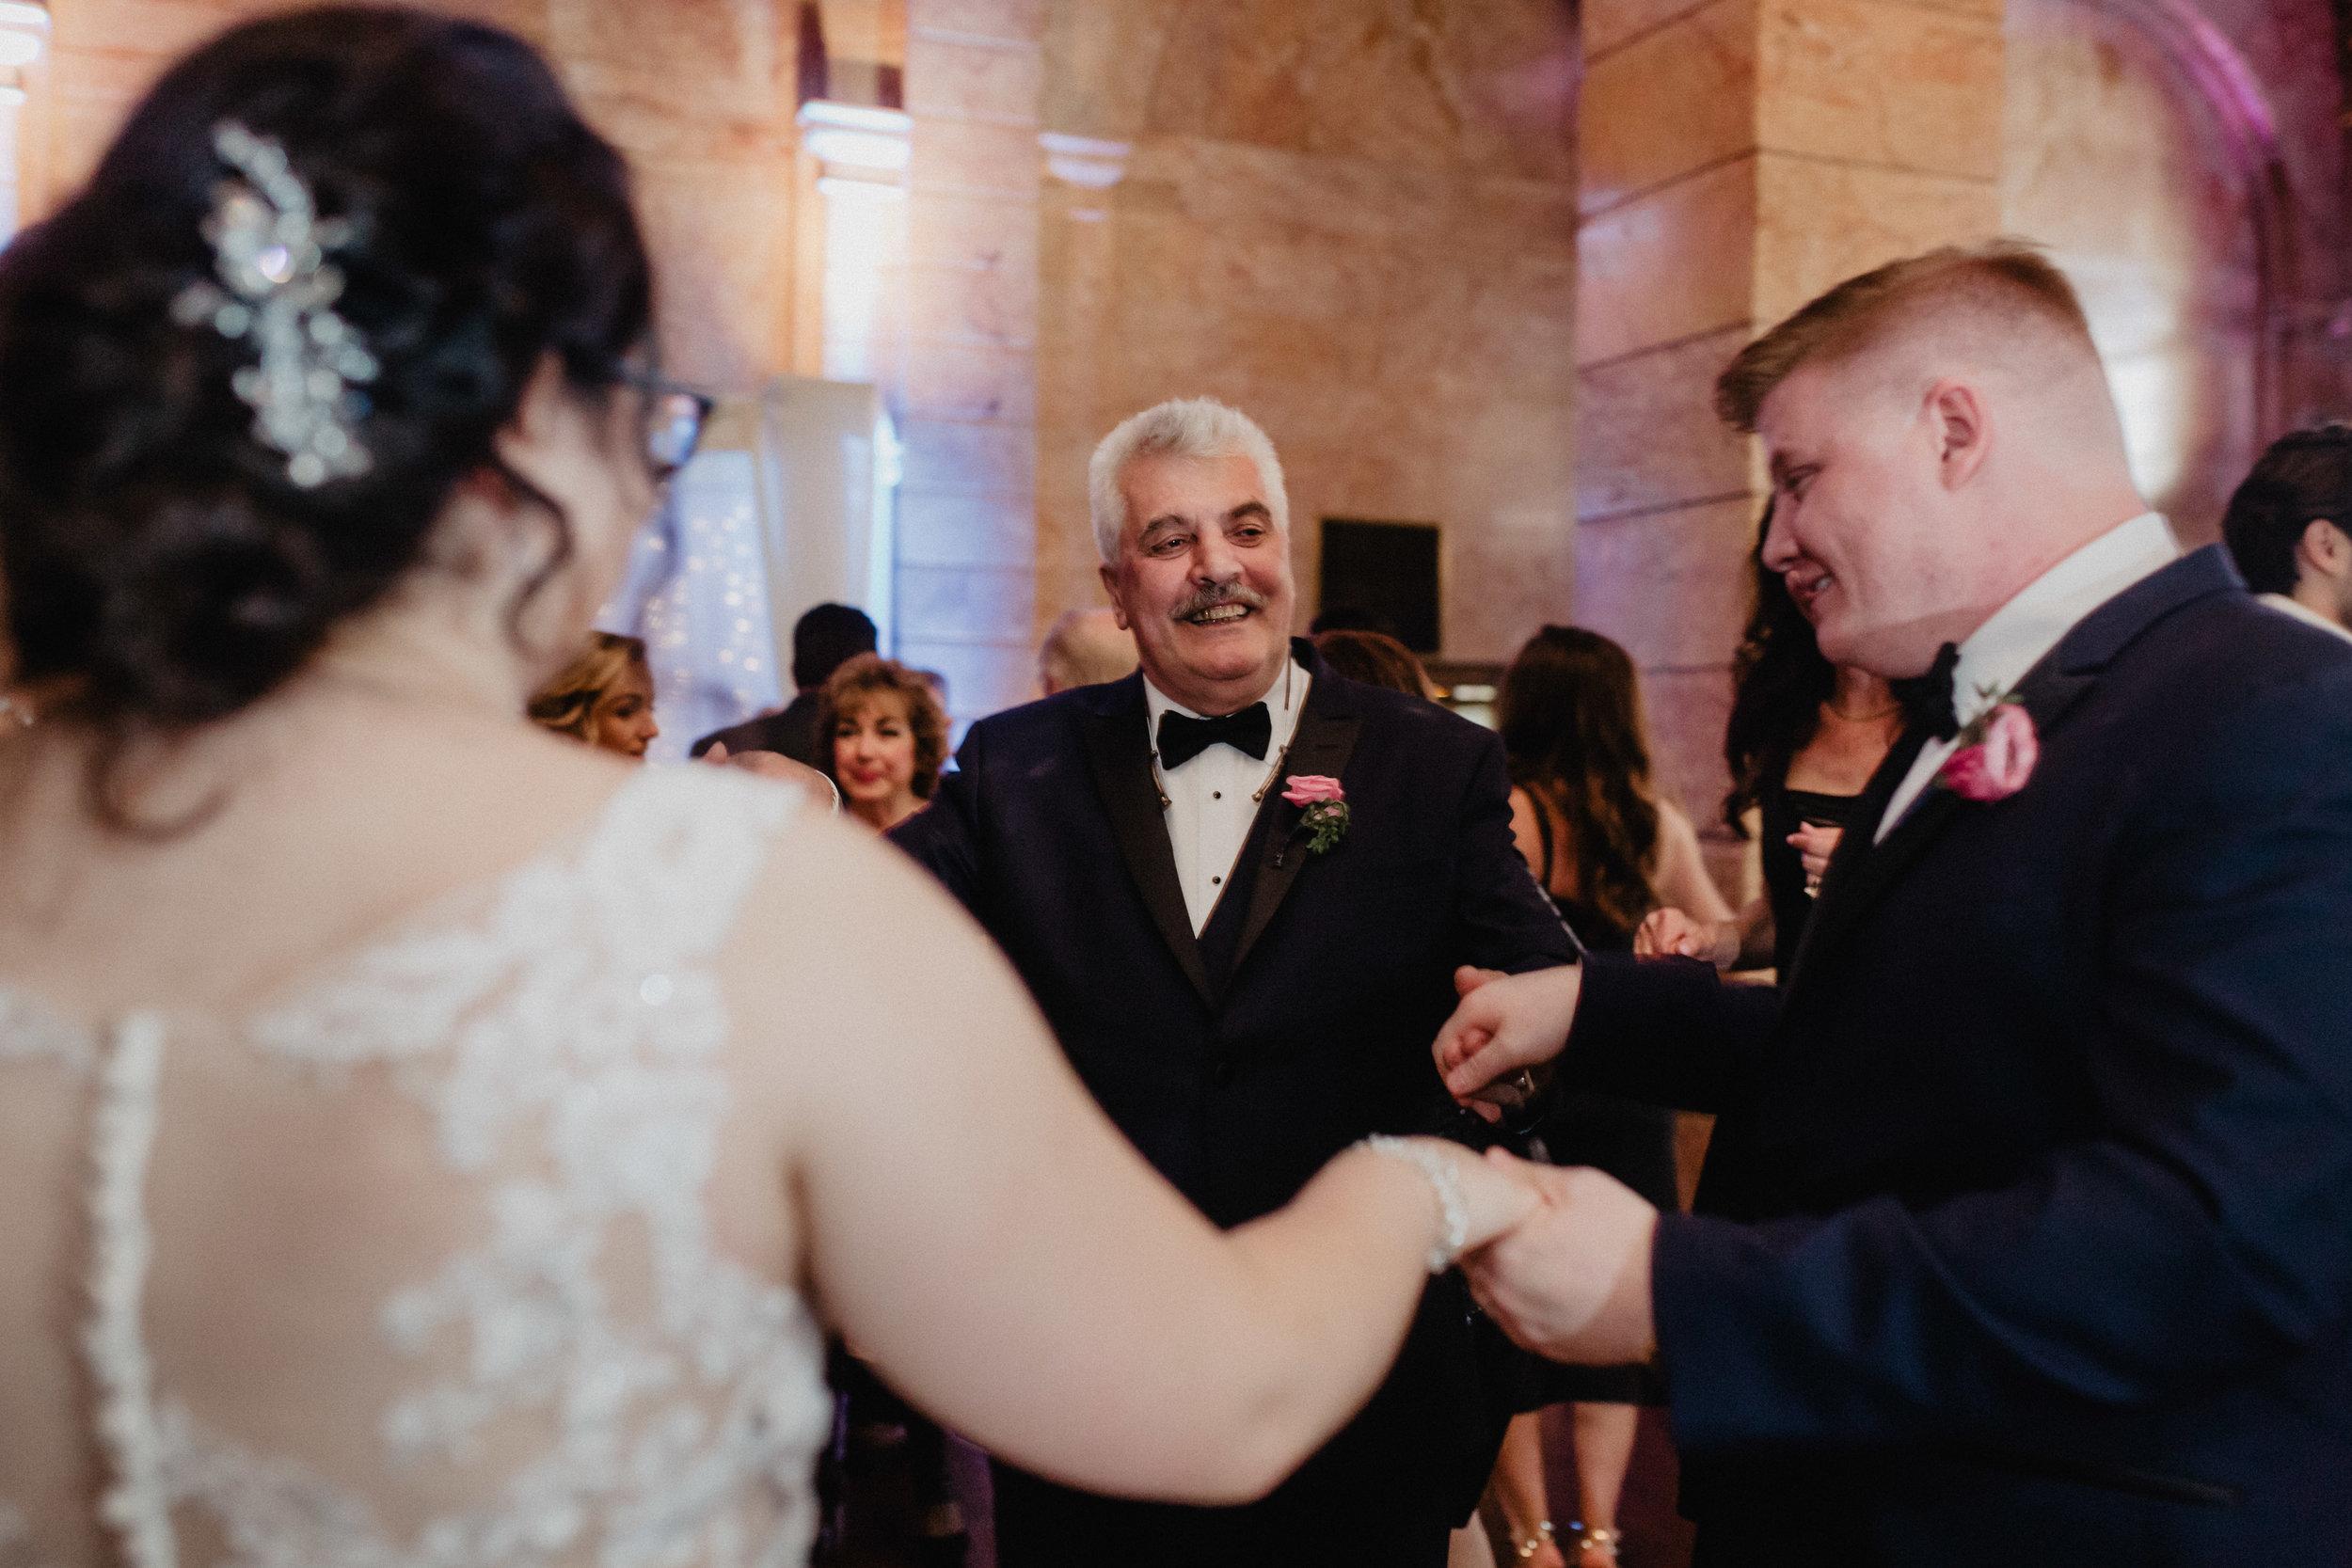 albany-new-york-wedding-58.jpg